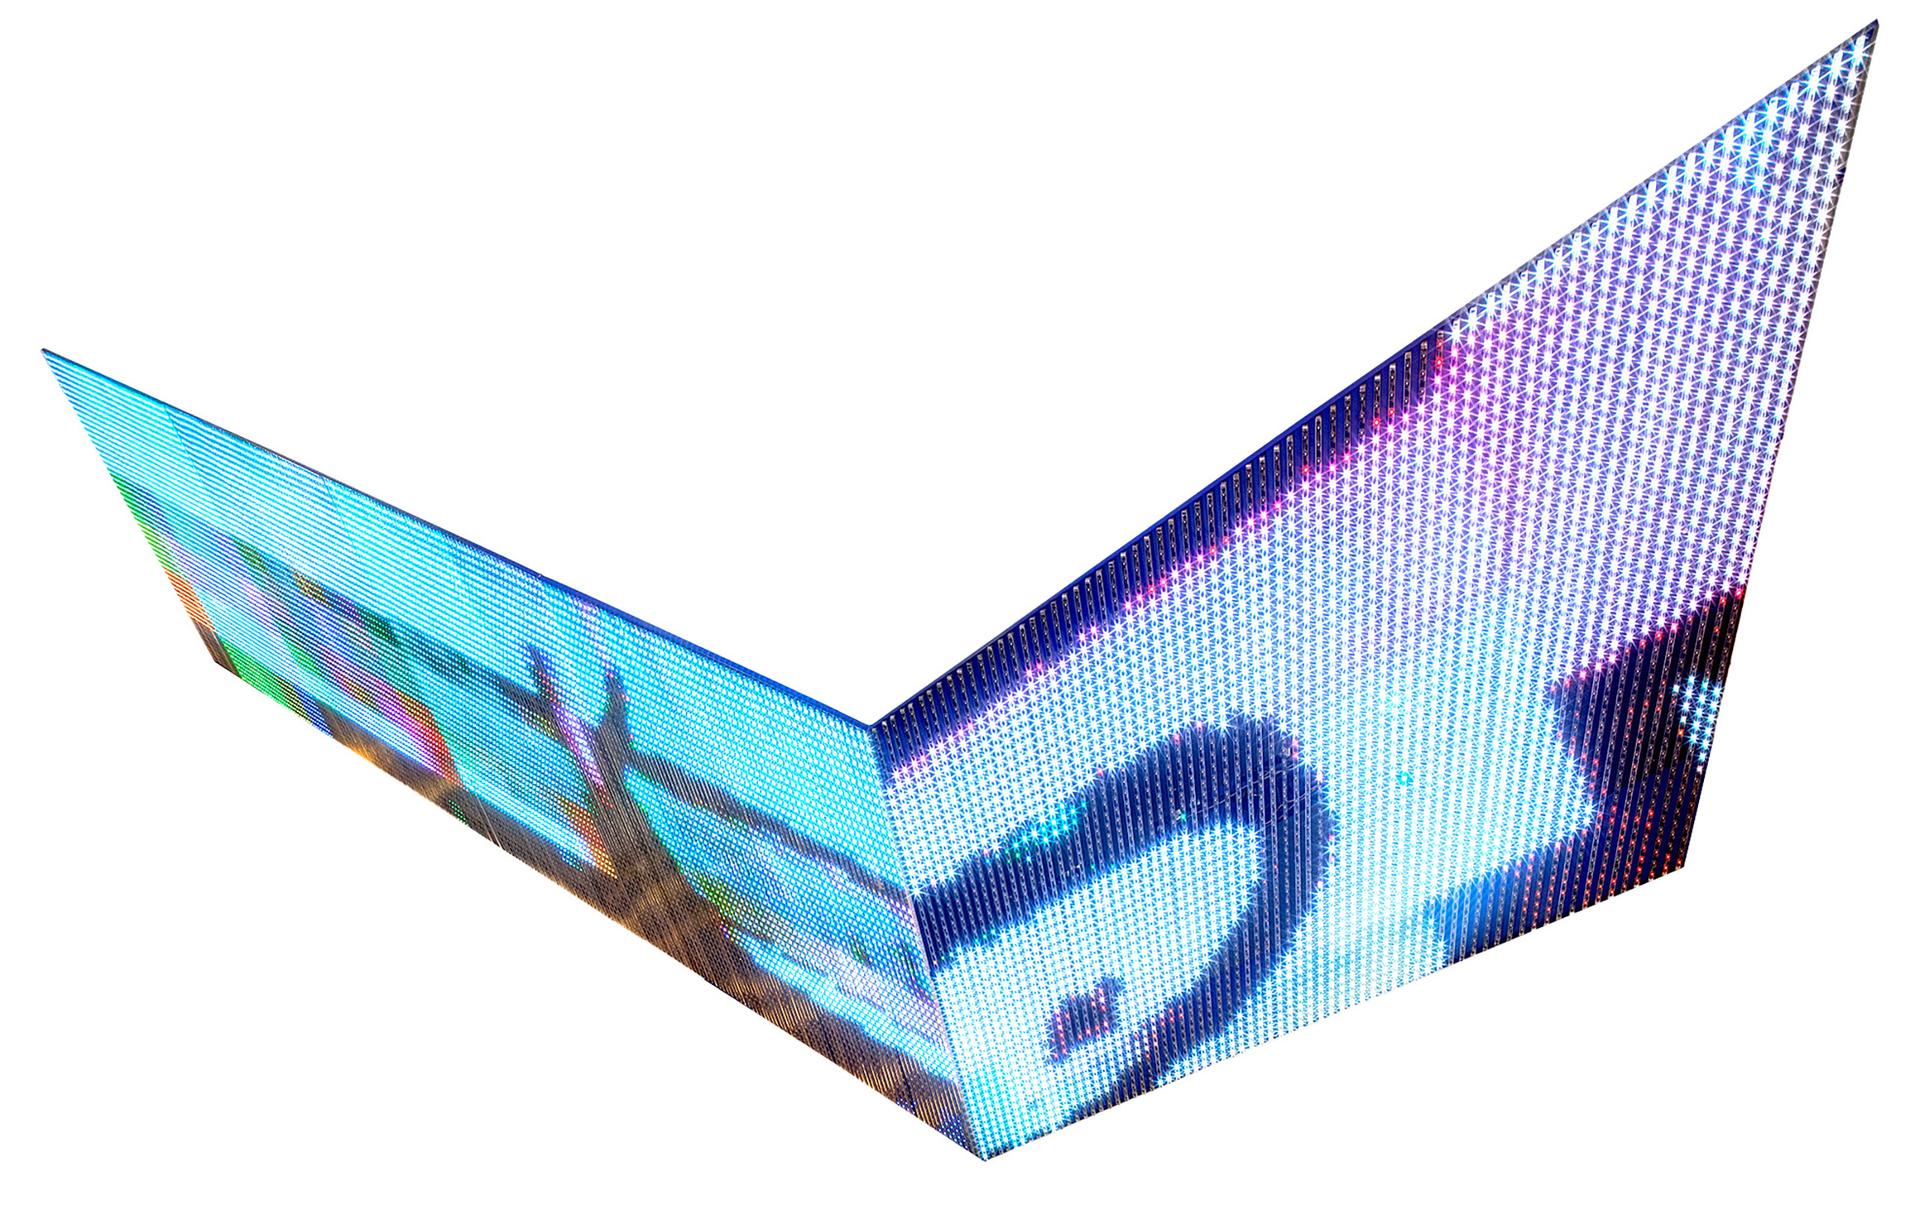 20180712-wg-installations-0004-layer-comp-5-1920x1215.jpg